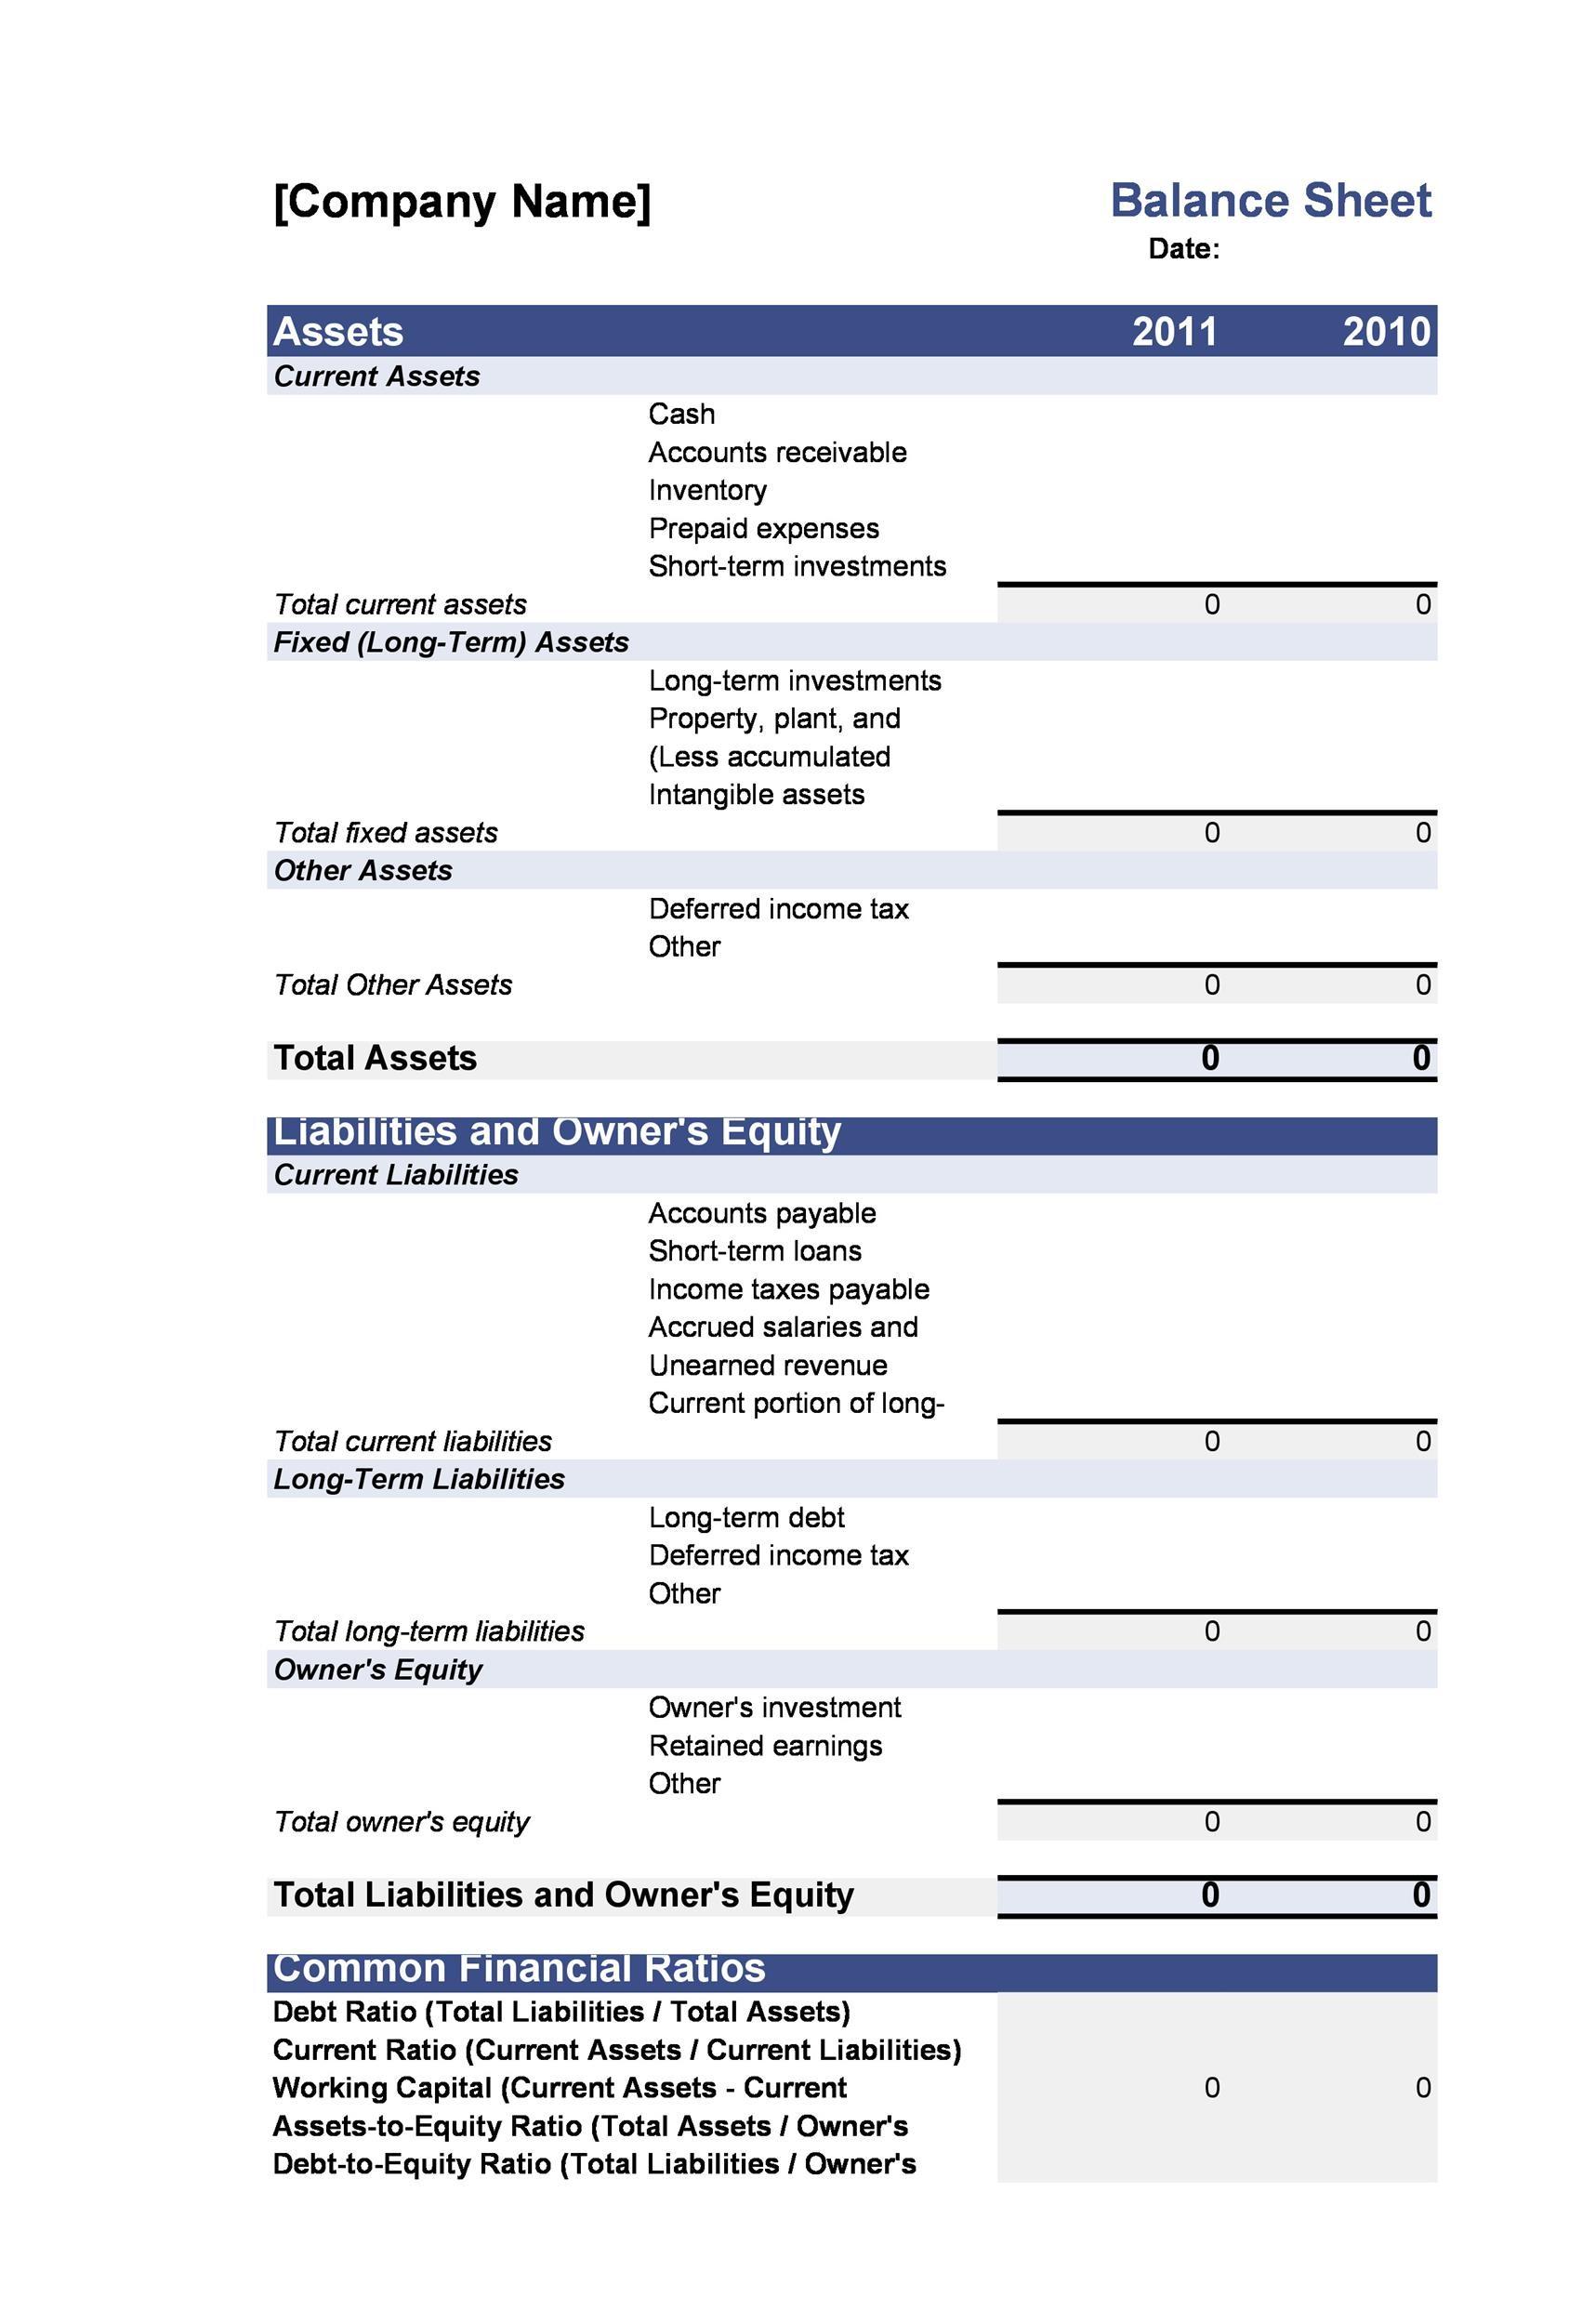 38 Free Balance Sheet Templates Amp Examples